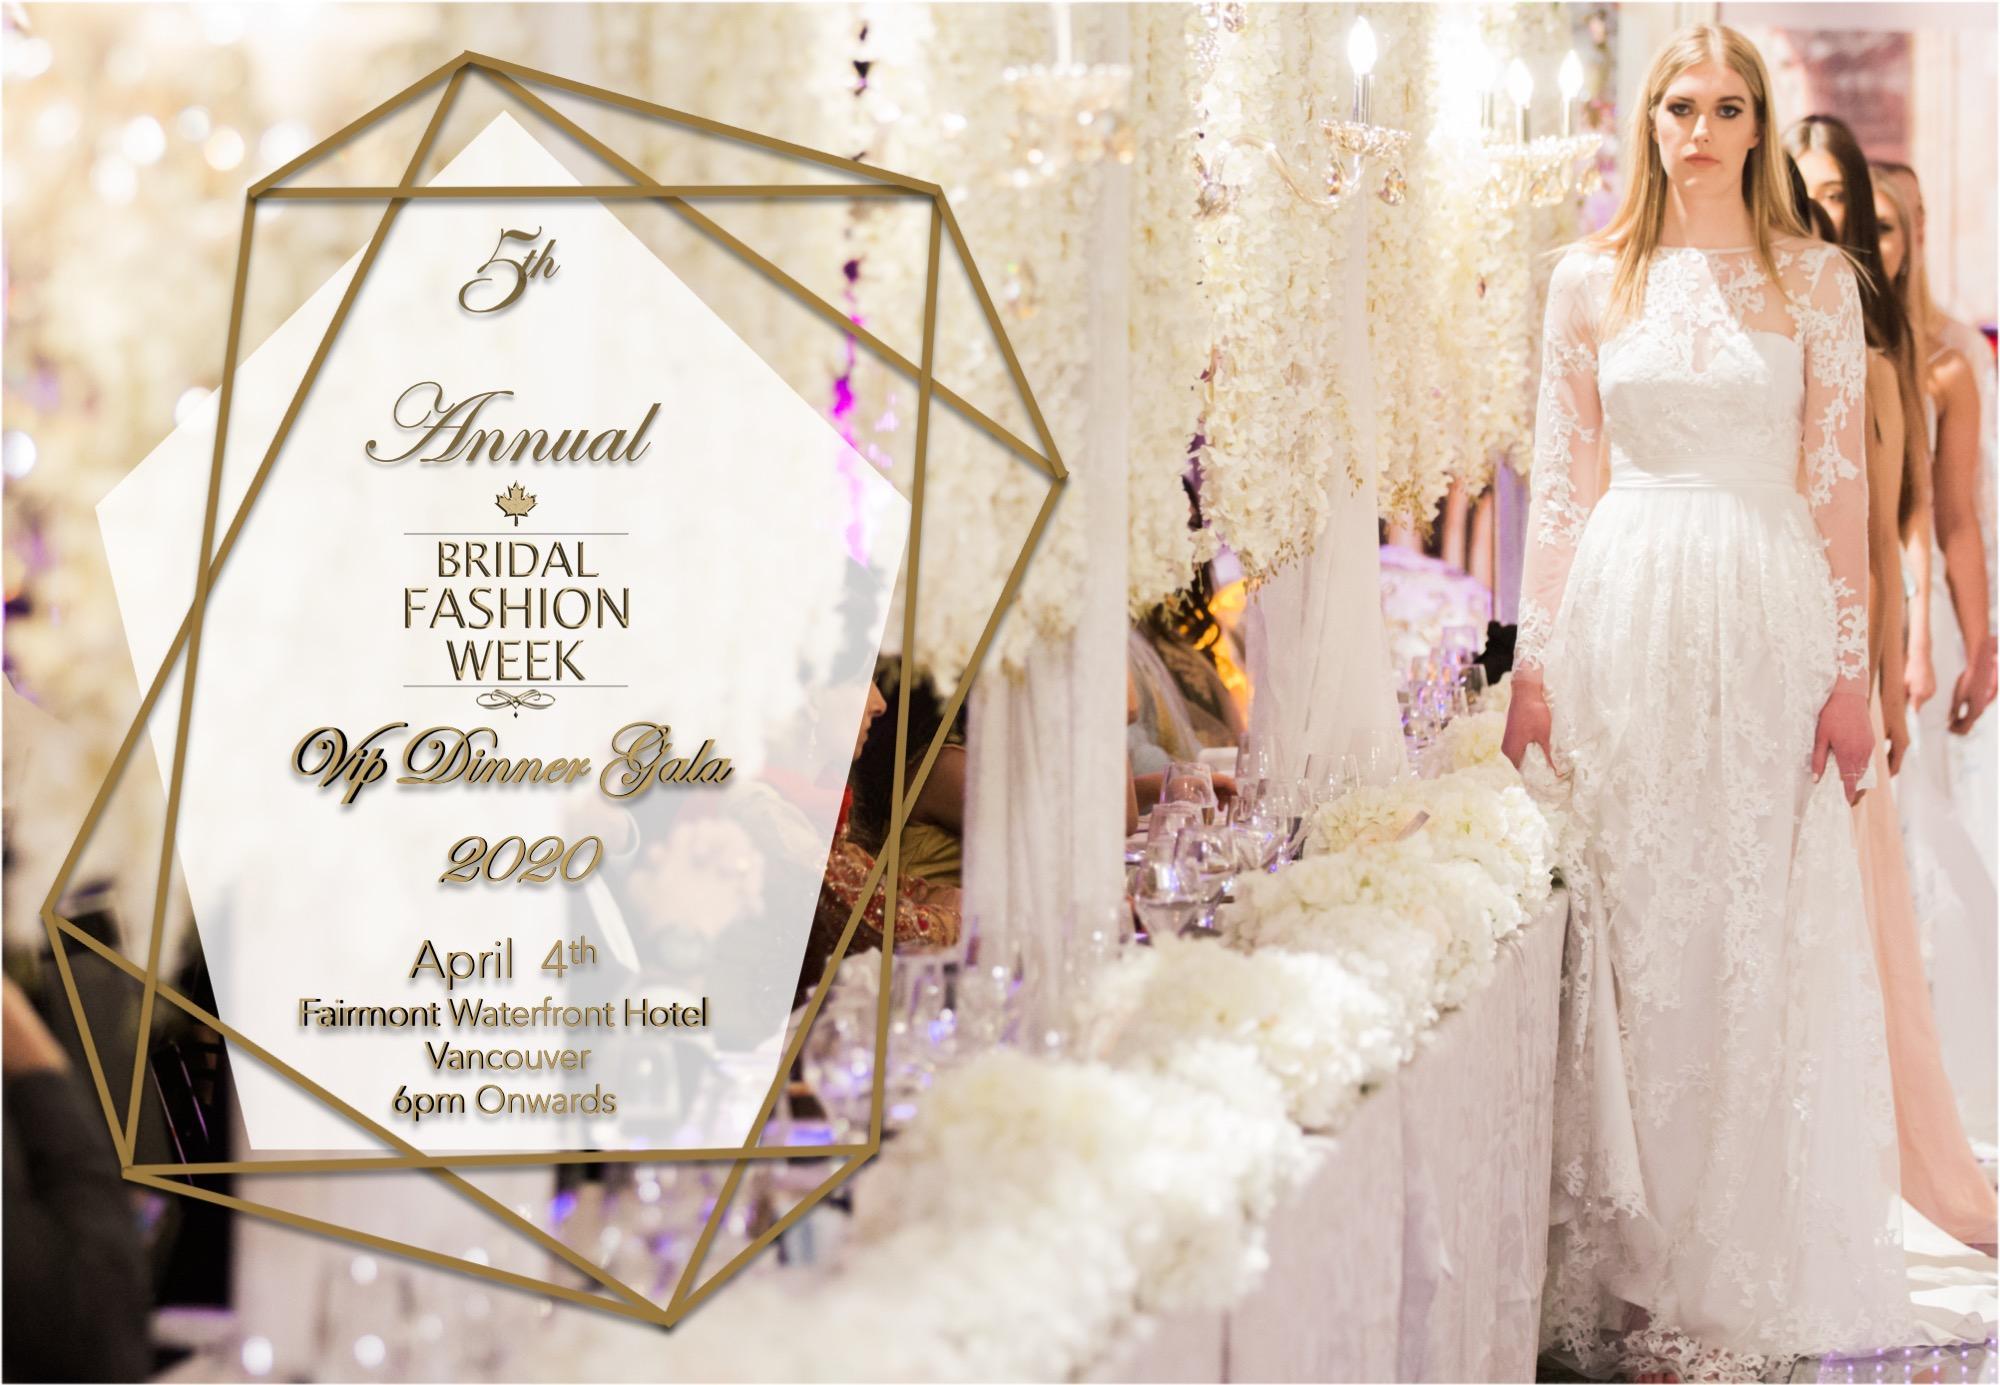 BRIDAL FASHION WEEK 2020 VIP DINNER GALA